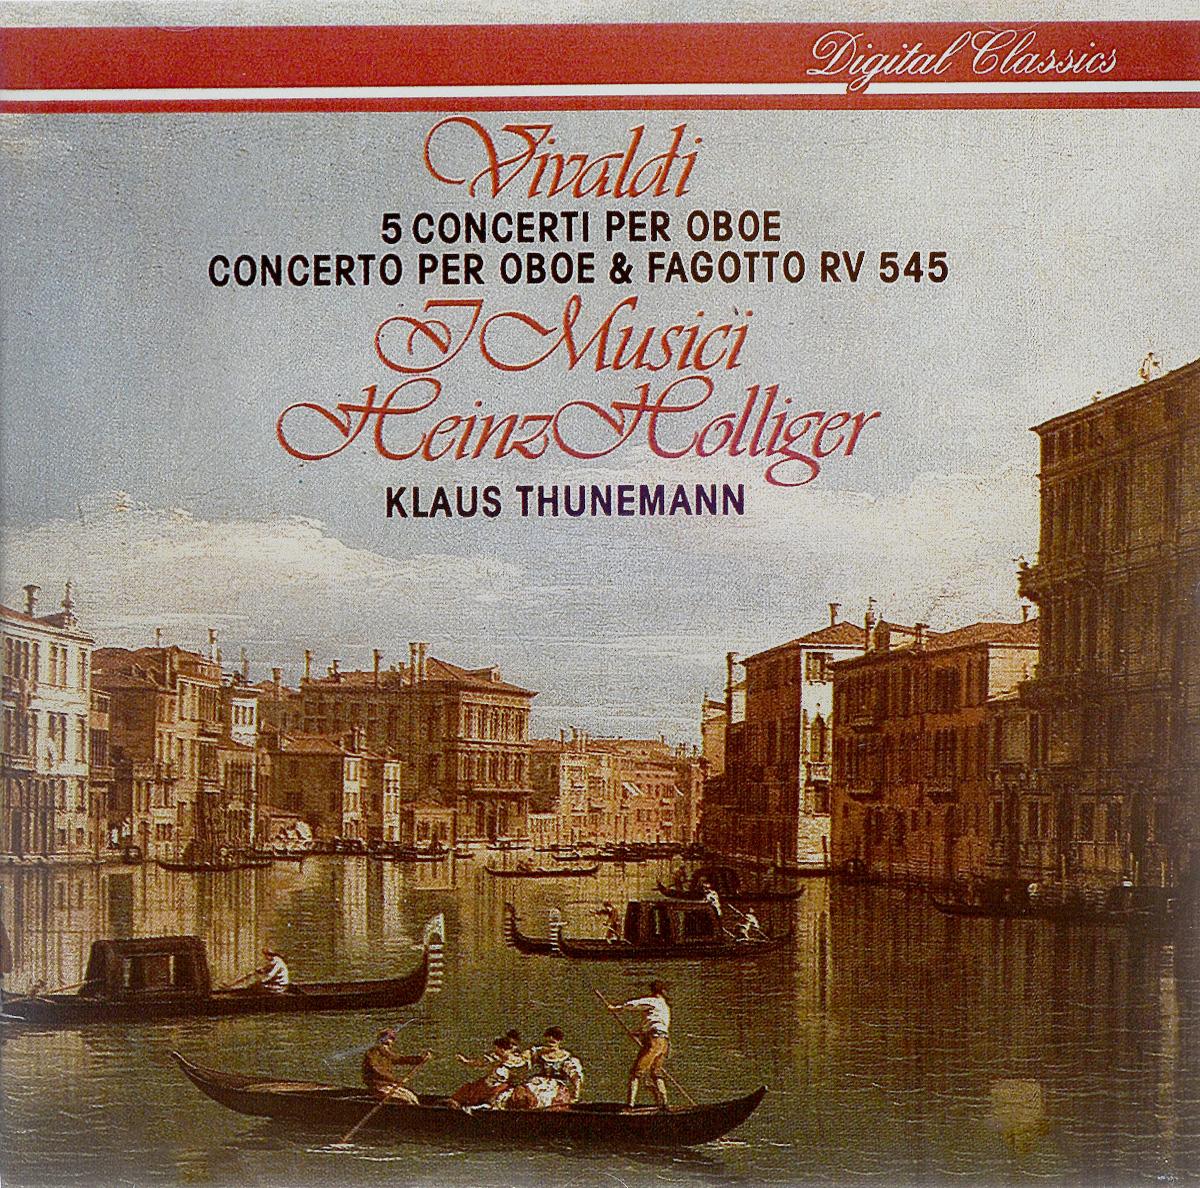 """I Musici"",Хайнц Холлигер,Клаус Тюнман I Musici. Vivaldi. 5 Concerto Per Oboe & Fagotto RV 545"